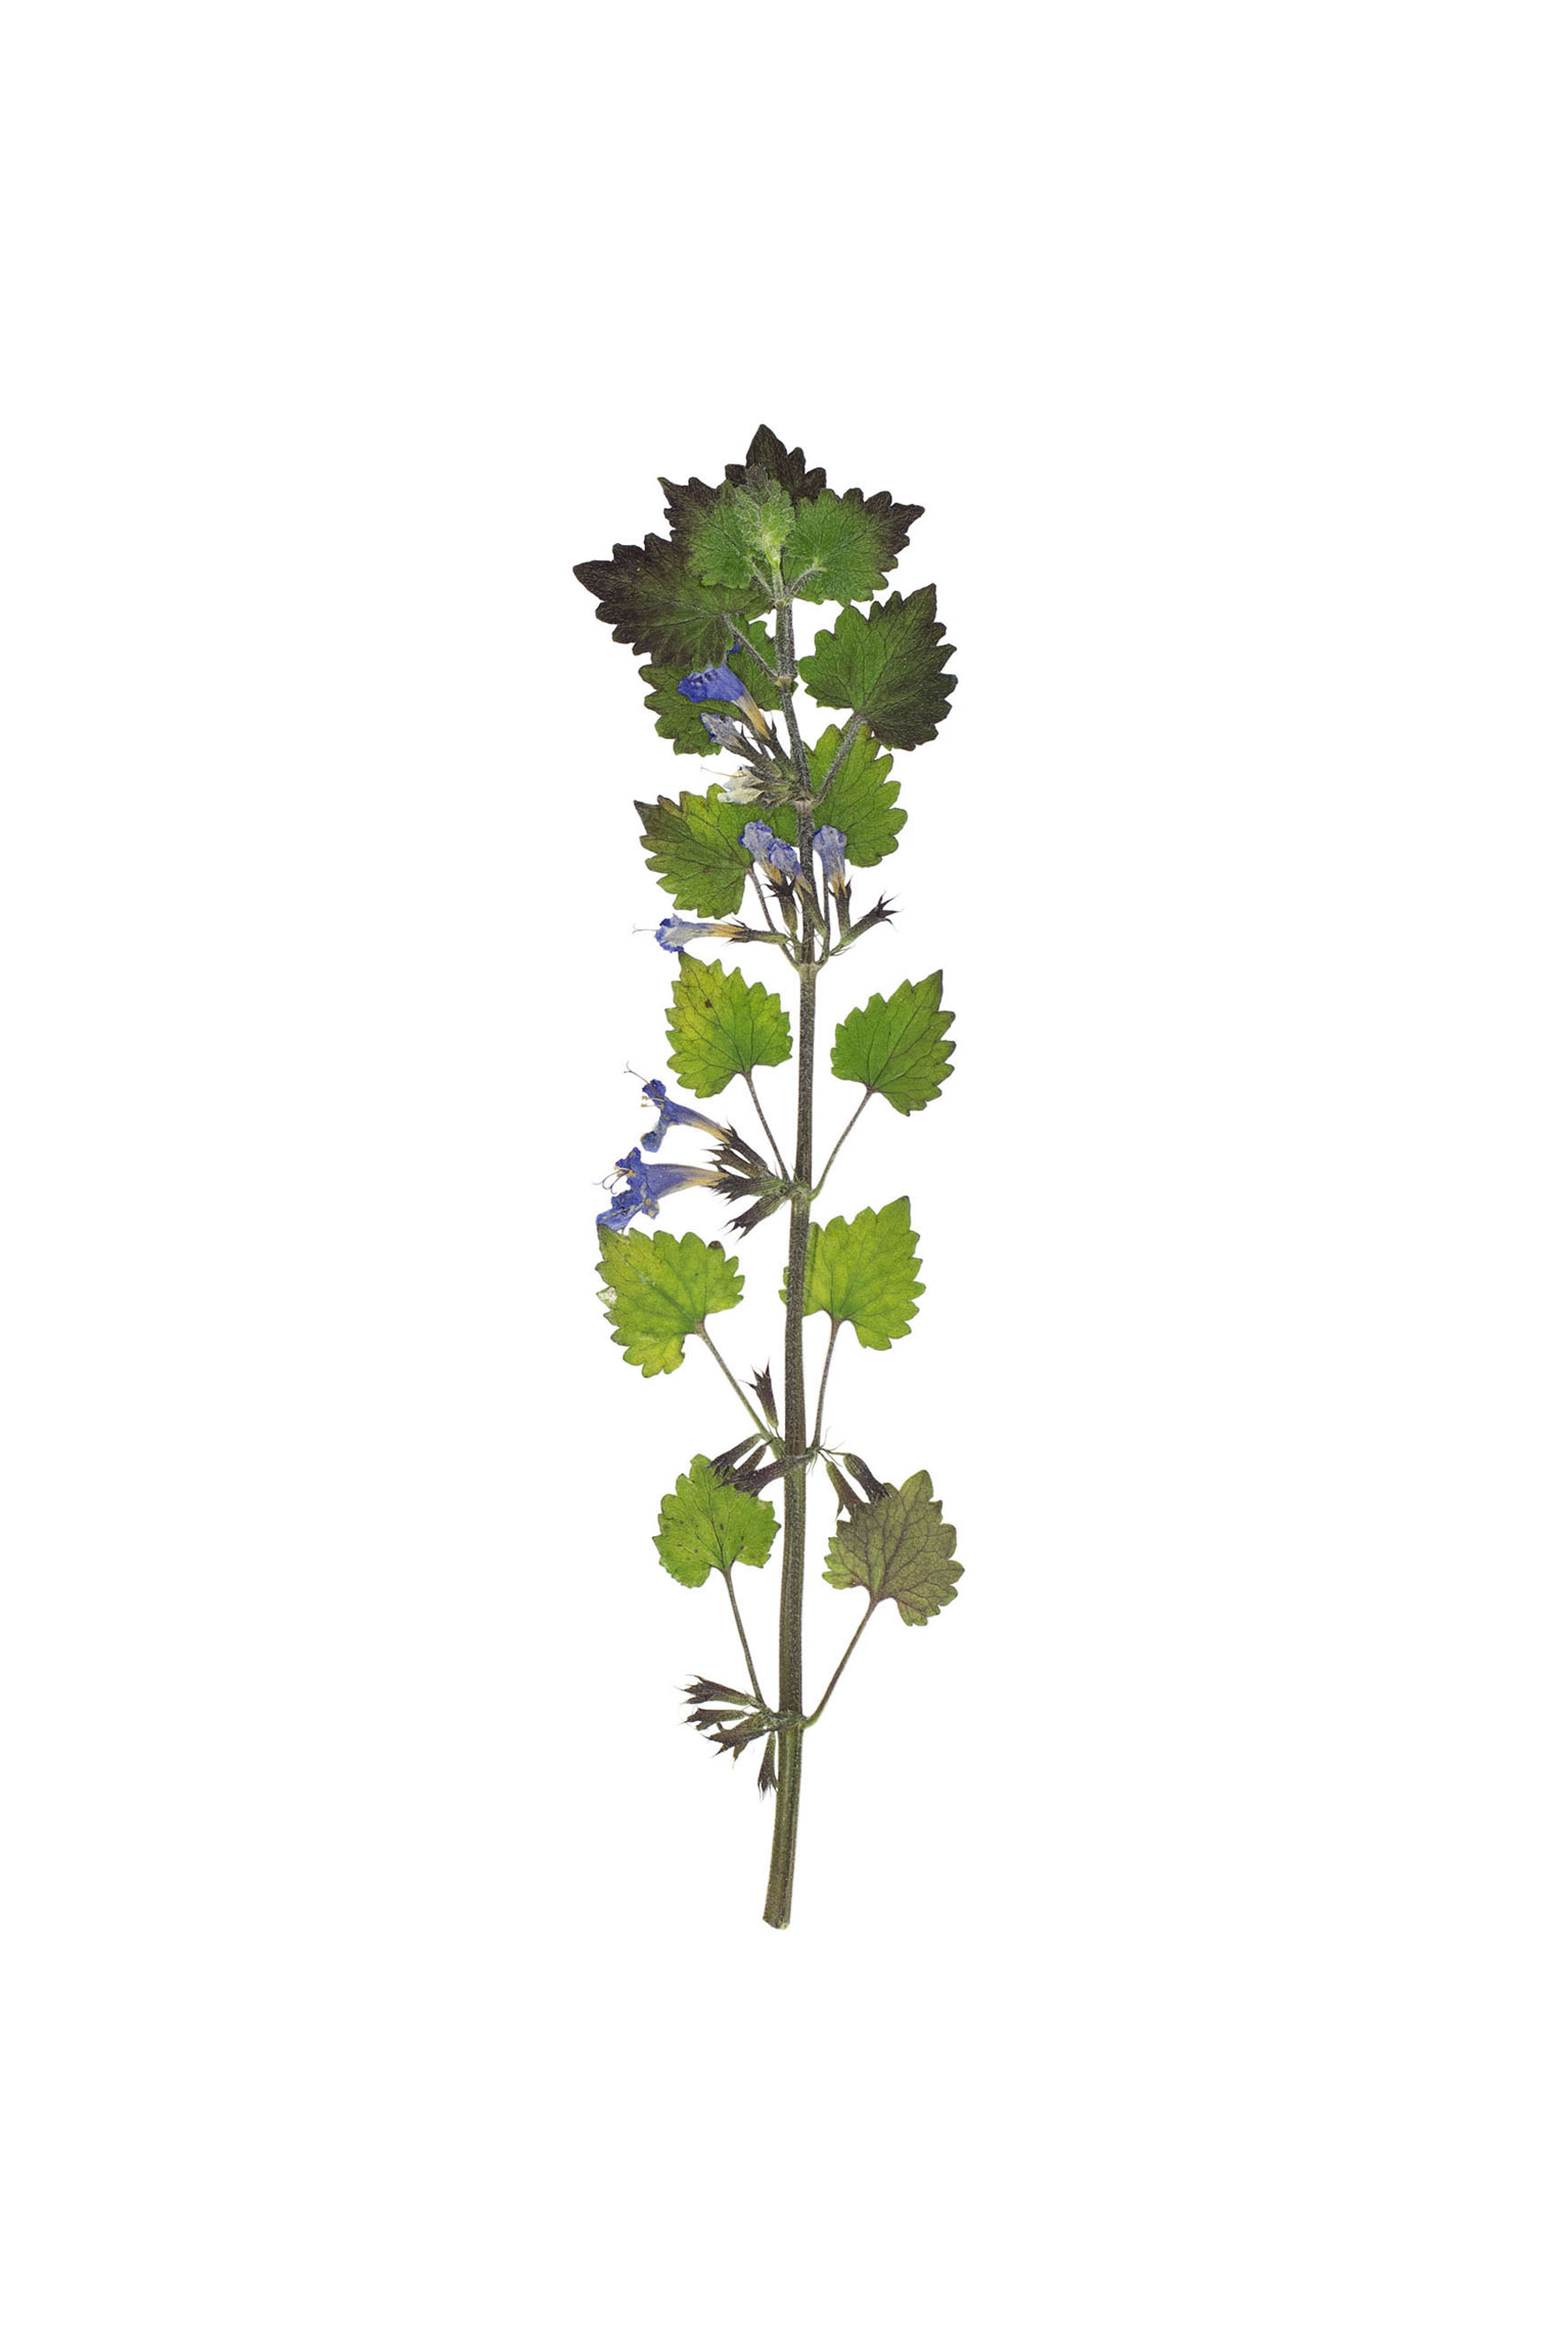 New! Ground Ivy / Glechoma hederacea